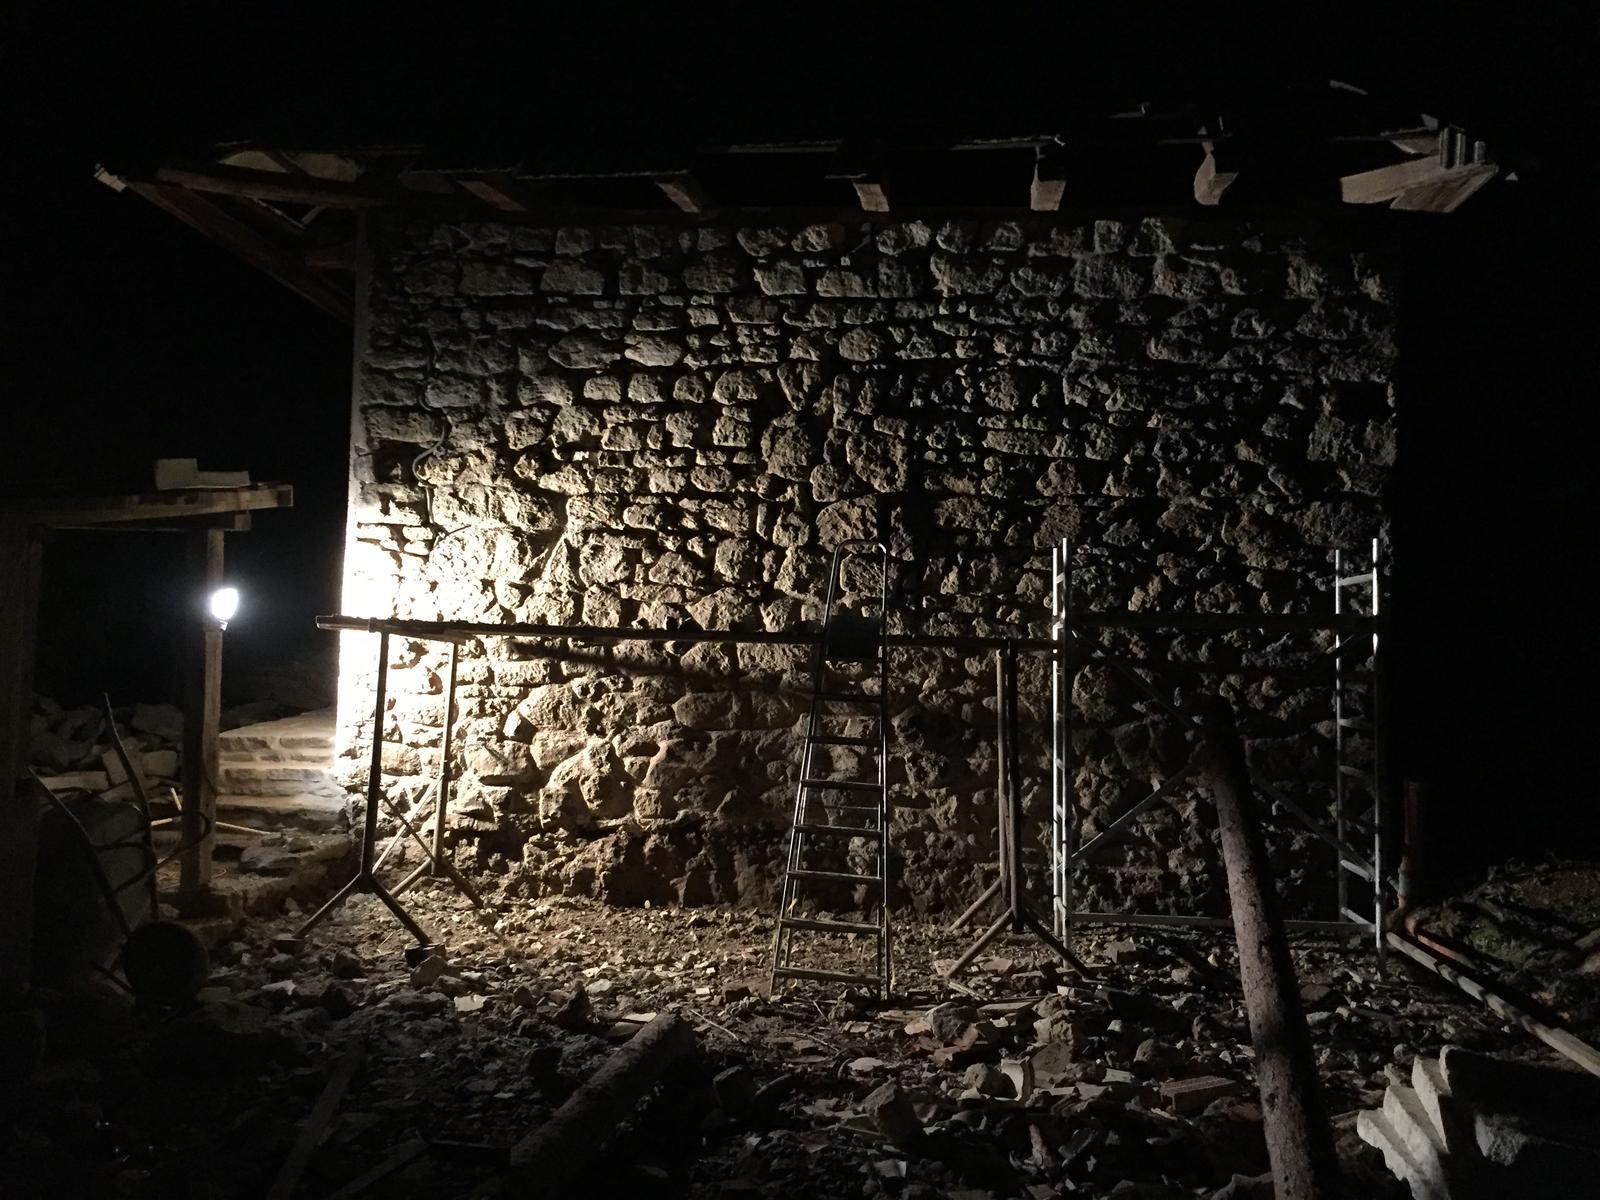 HACIENDA NAPOLI SEBECHLEBY - Mala ochutnavka toho ako bude vyzerat zadna strana altanku po dokonceni